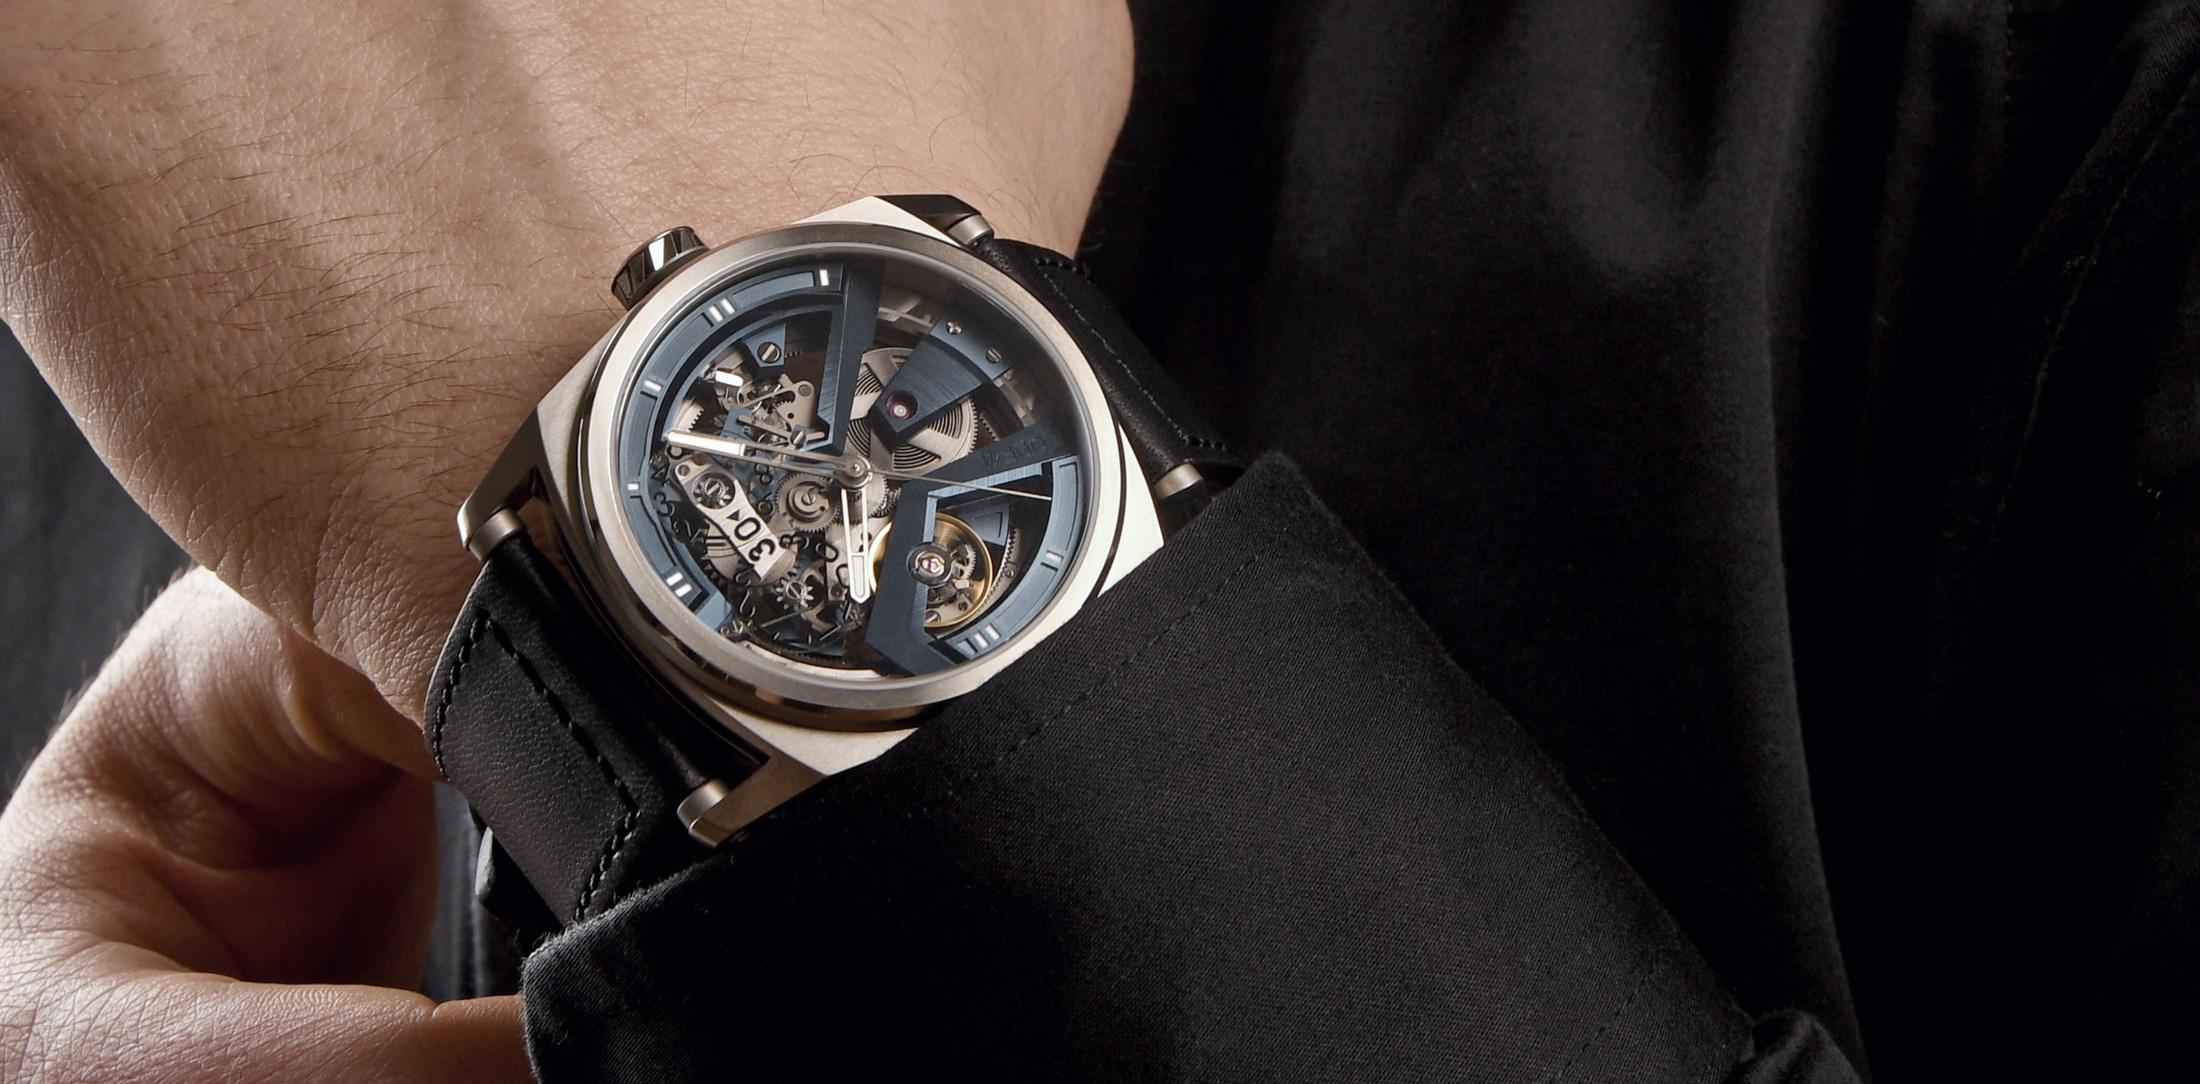 X41Quintessential Watchmaking X41Quintessential X41Quintessential Watchmaking X41Quintessential Watchmaking Watchmaking X41Quintessential X41Quintessential X41Quintessential X41Quintessential Watchmaking Watchmaking X41Quintessential Watchmaking Watchmaking KJ3uFcTl1